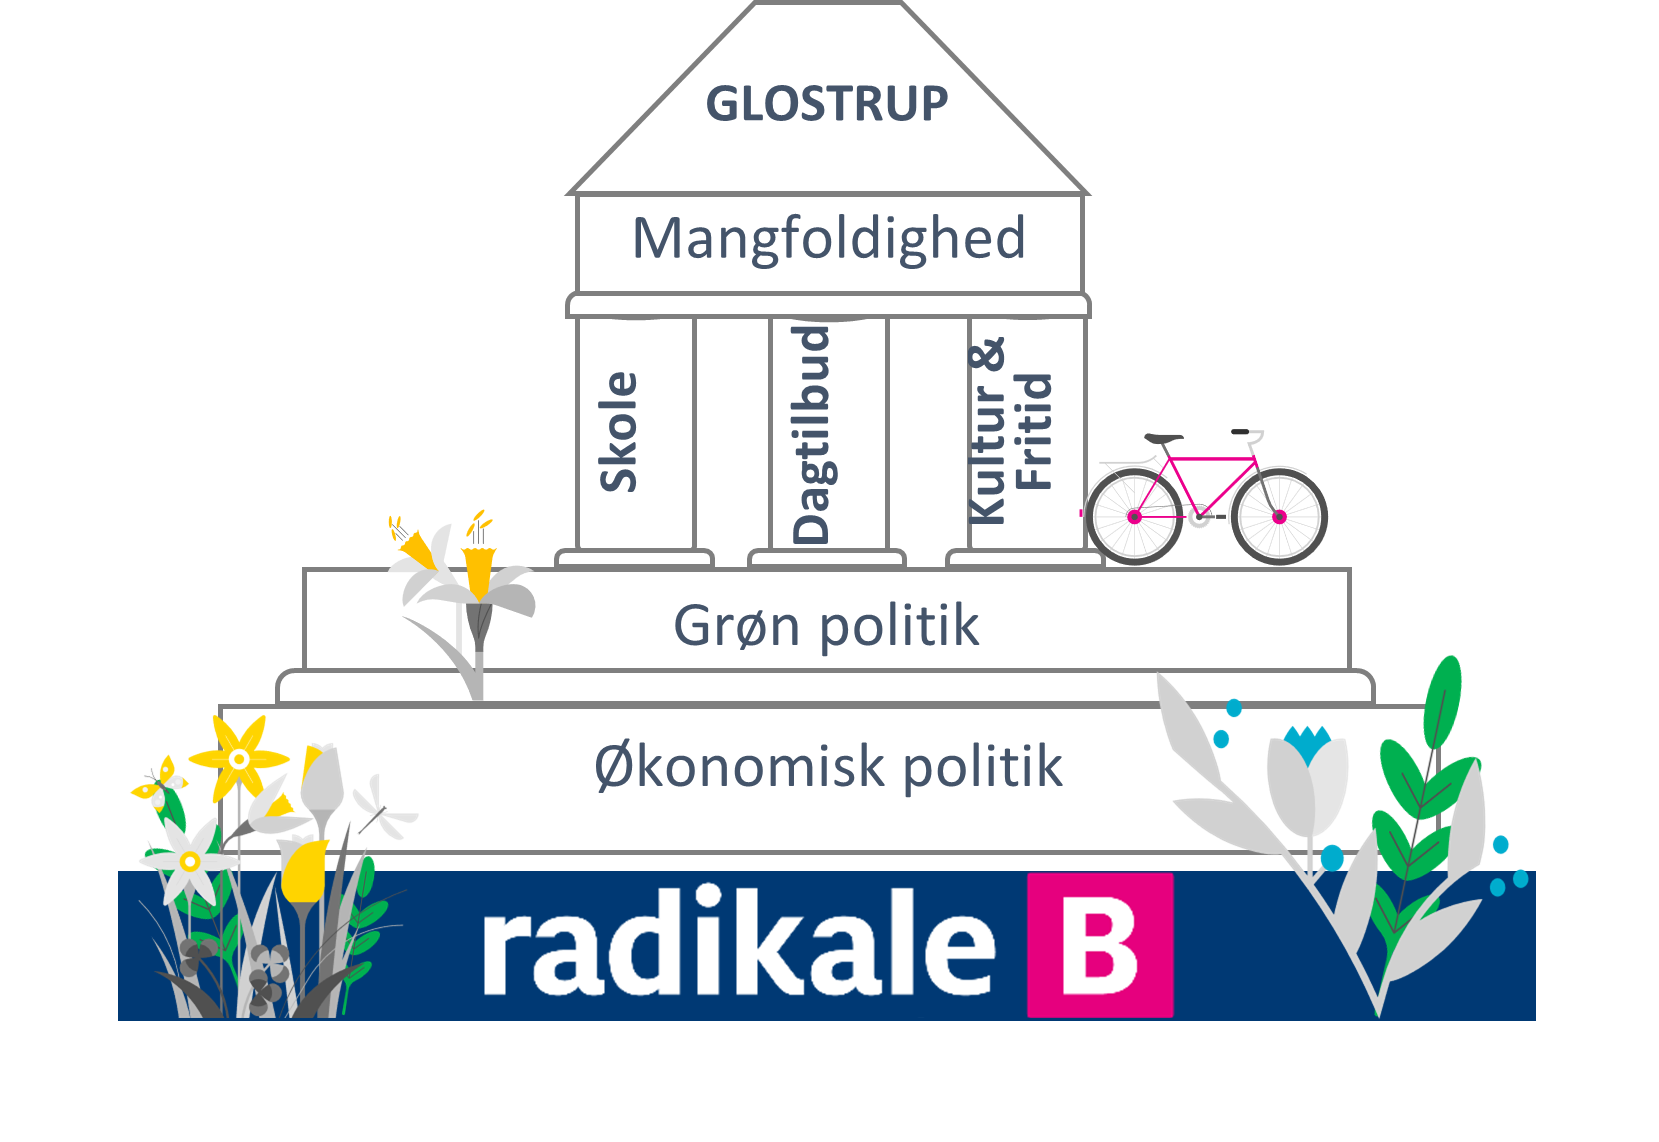 https://usercontent.one/wp/glostrupradikale.dk/wp-content/uploads/2021/04/GRV-Hus.png